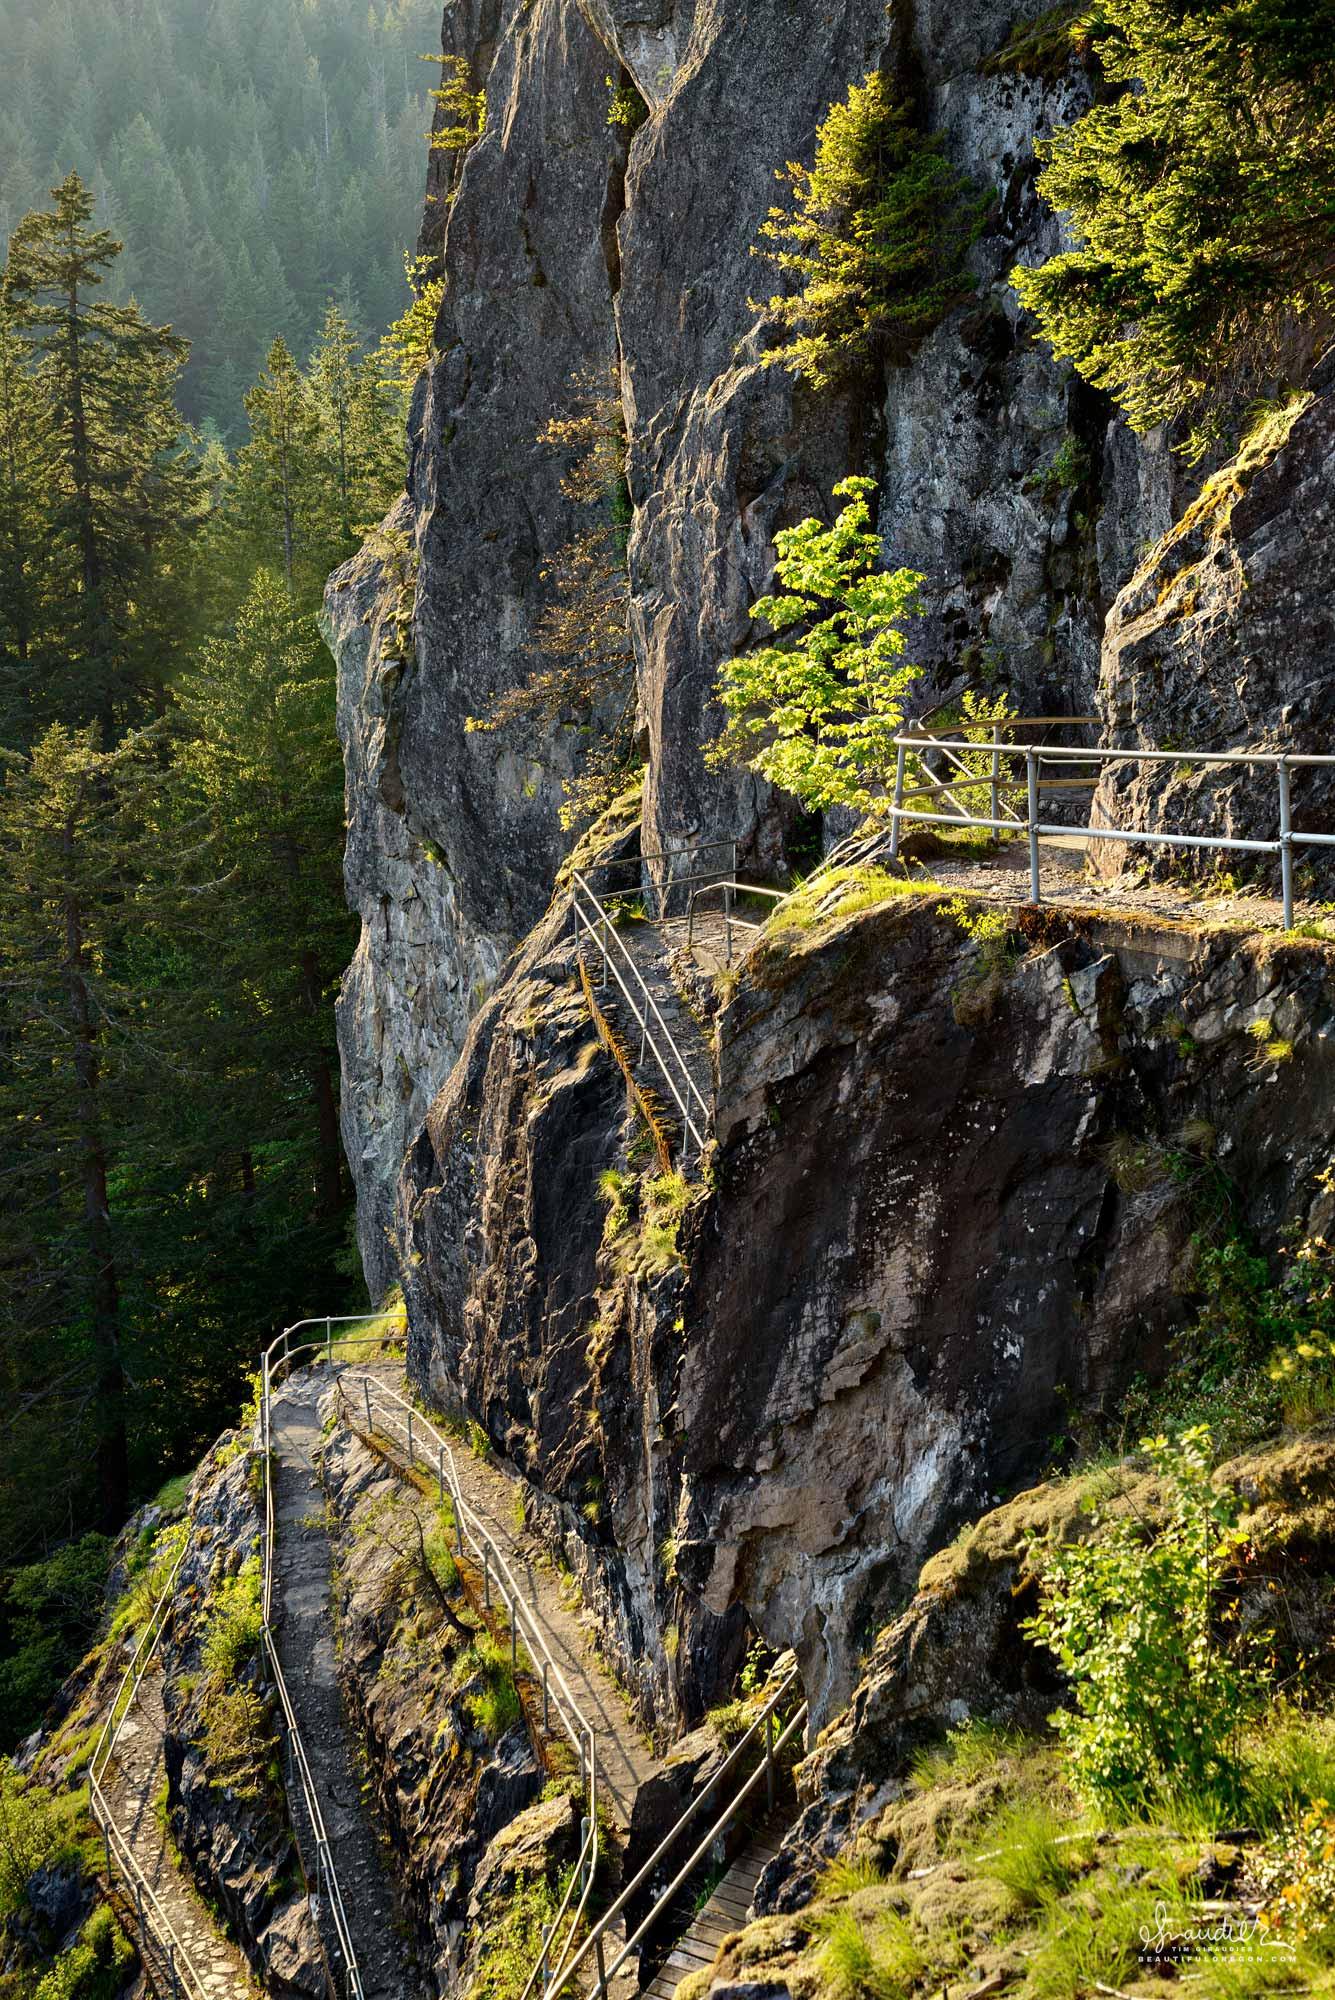 Staircase path to summit of Beacon Rock. Columbia River Gorge, Skamania County Washington State.